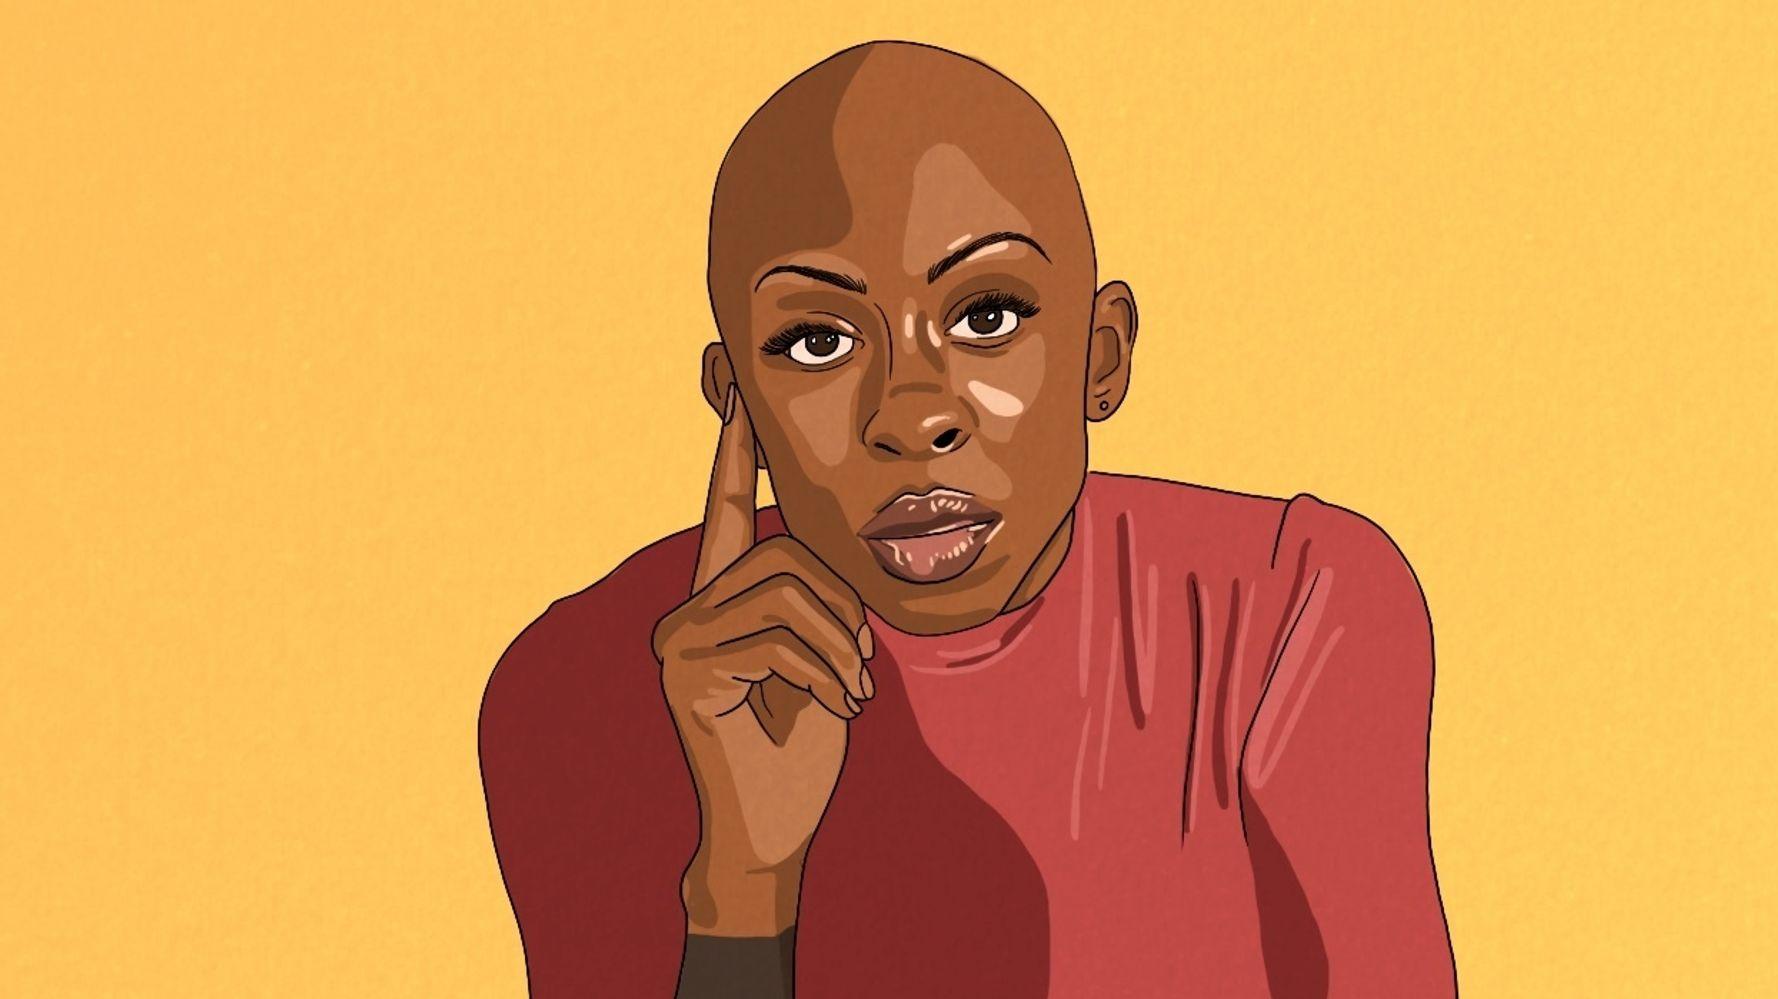 Oge Egbuonu's New Documentary Is 'A Love Letter To Black Women'